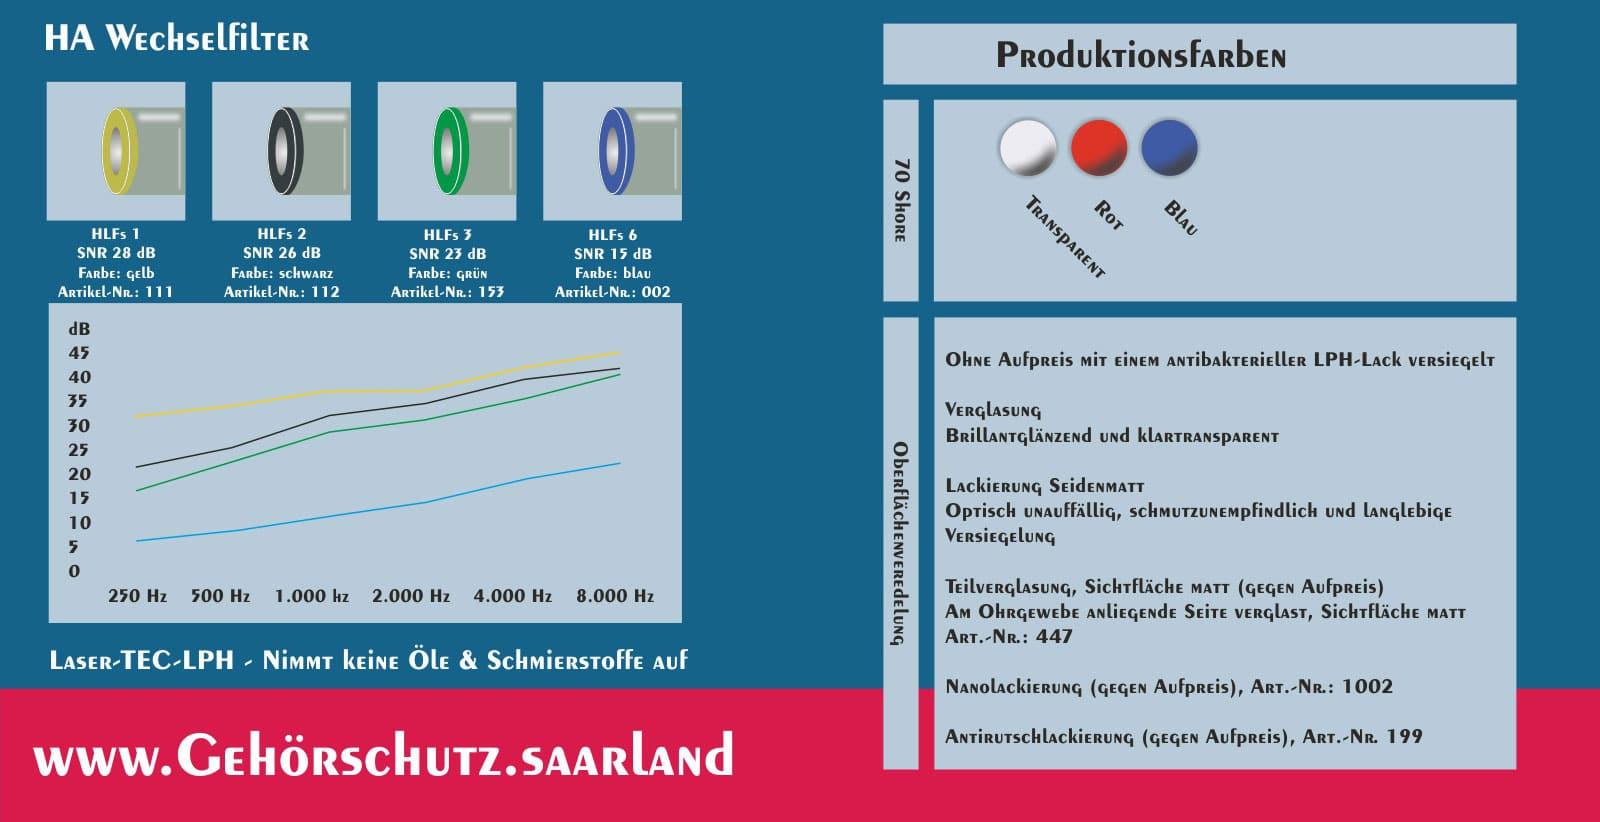 Lärm & Schmutz HA Gehörschutz Hörluchs Wechselfilter und Dämmgrafik - Gisbrecht Hörakustik Saarland